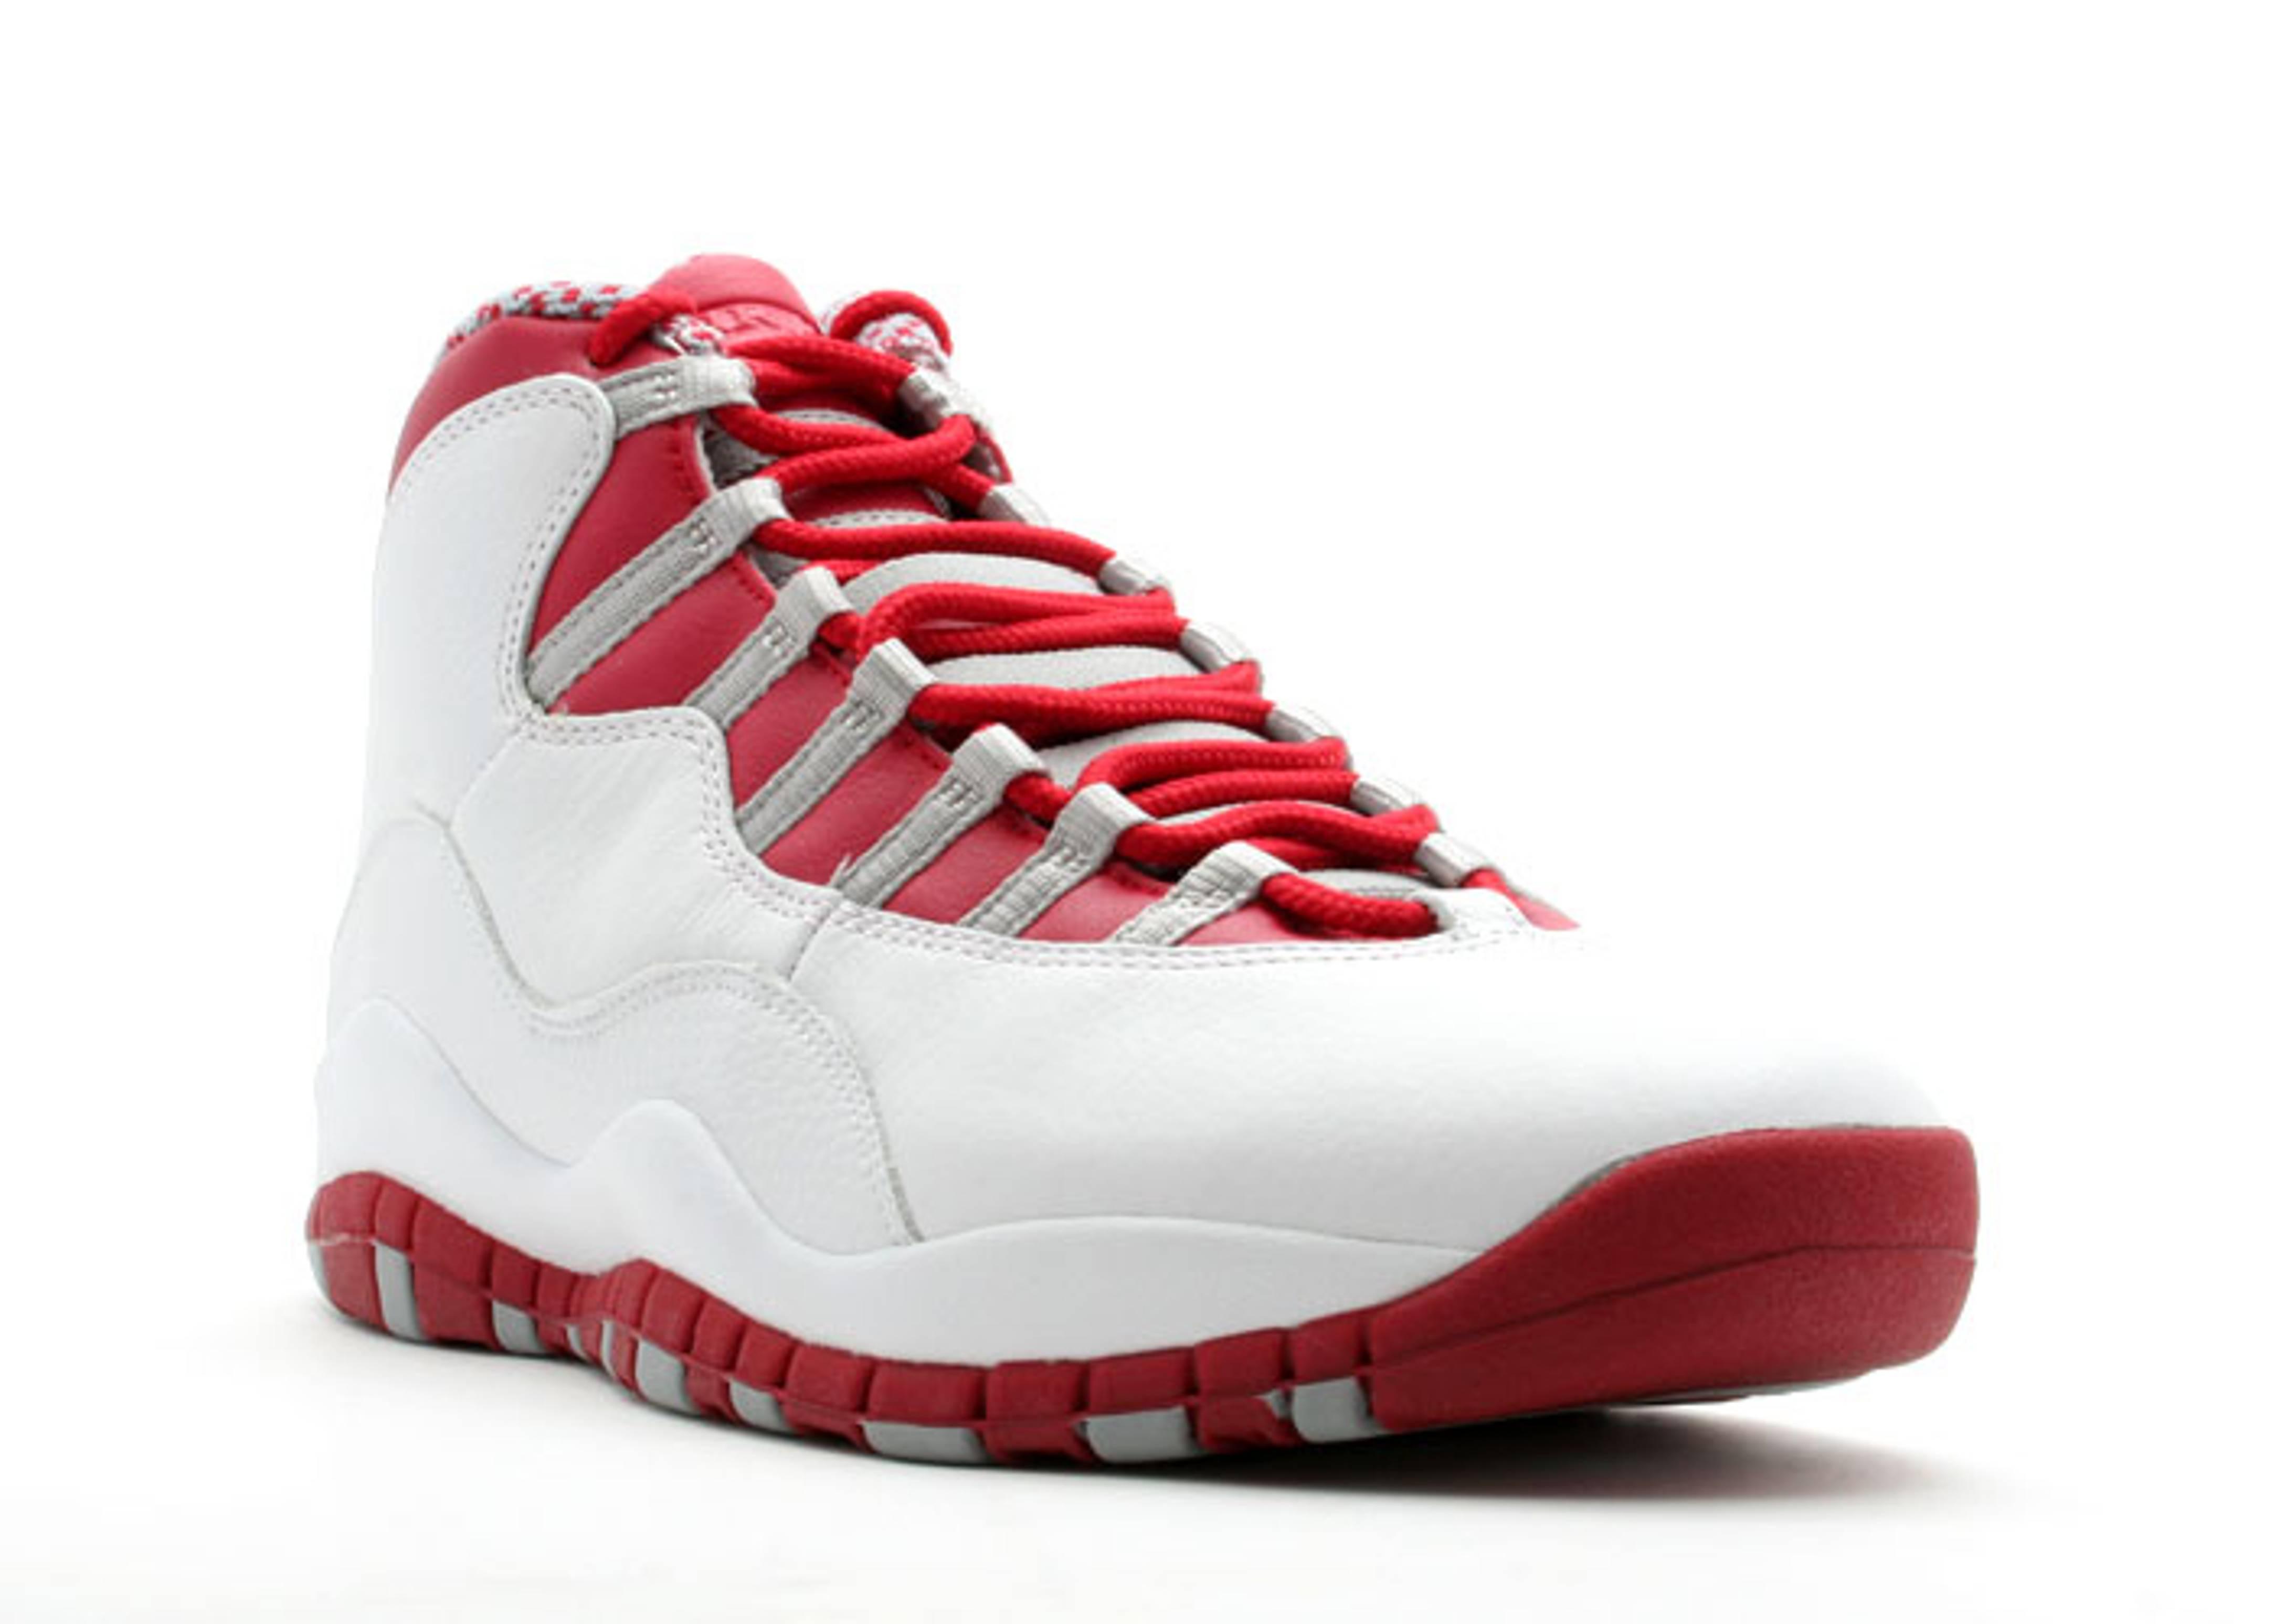 air jordan 10 red and white